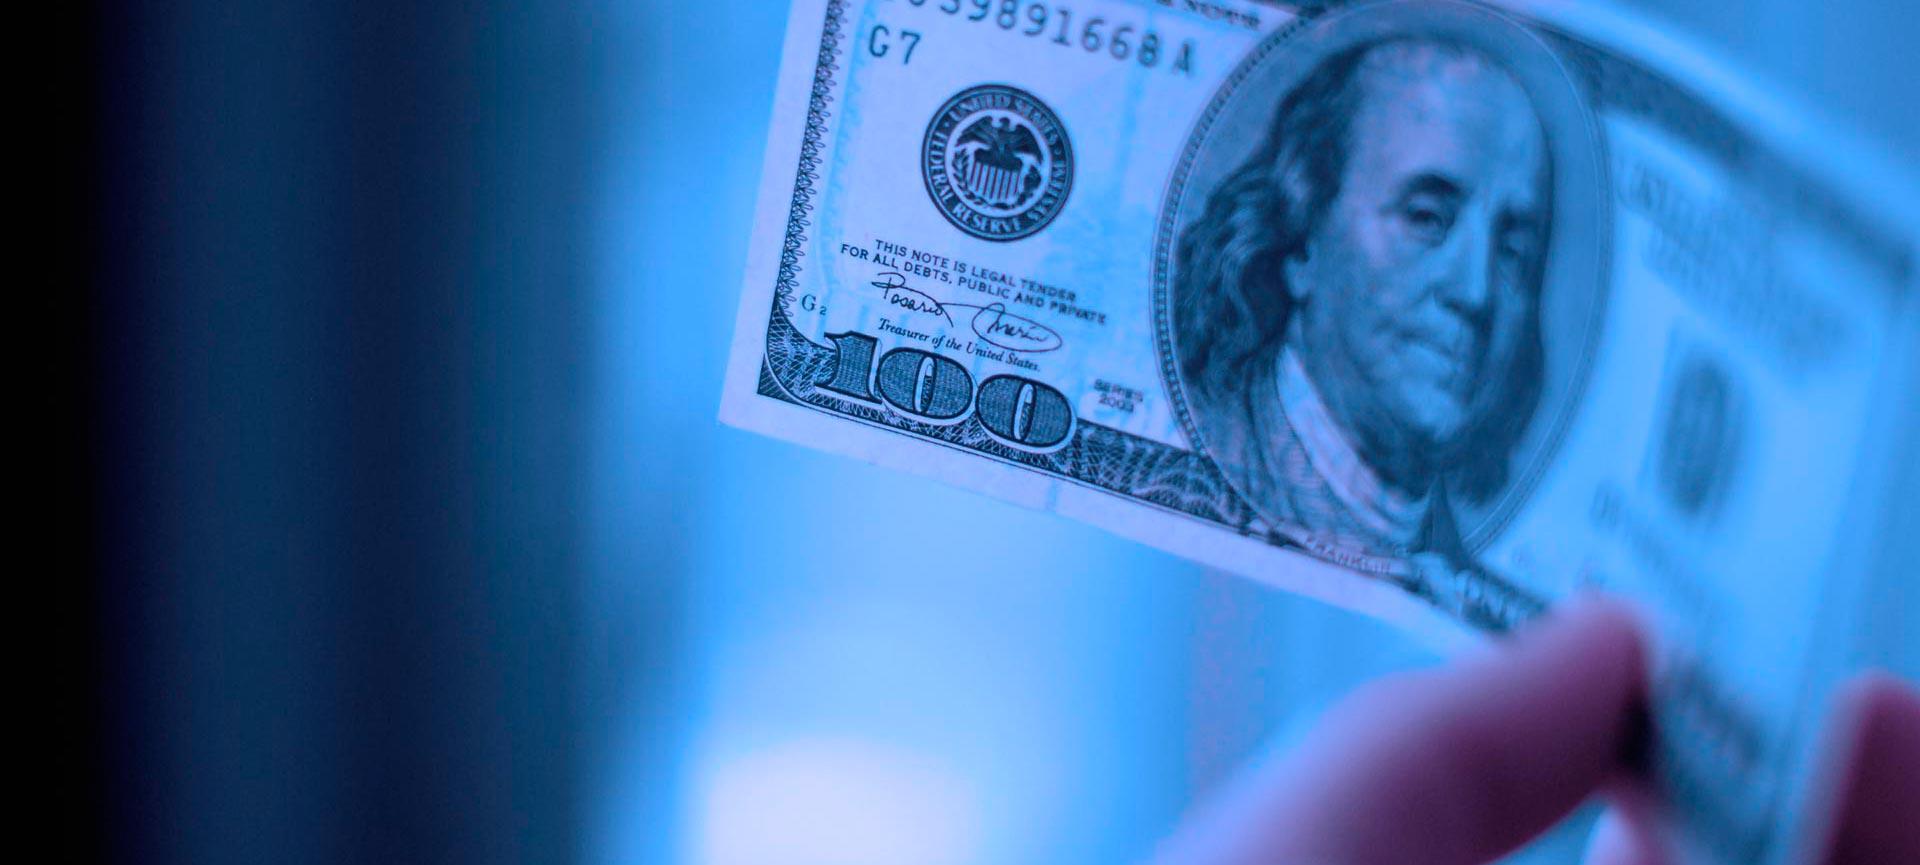 dolar_blue_2_caja